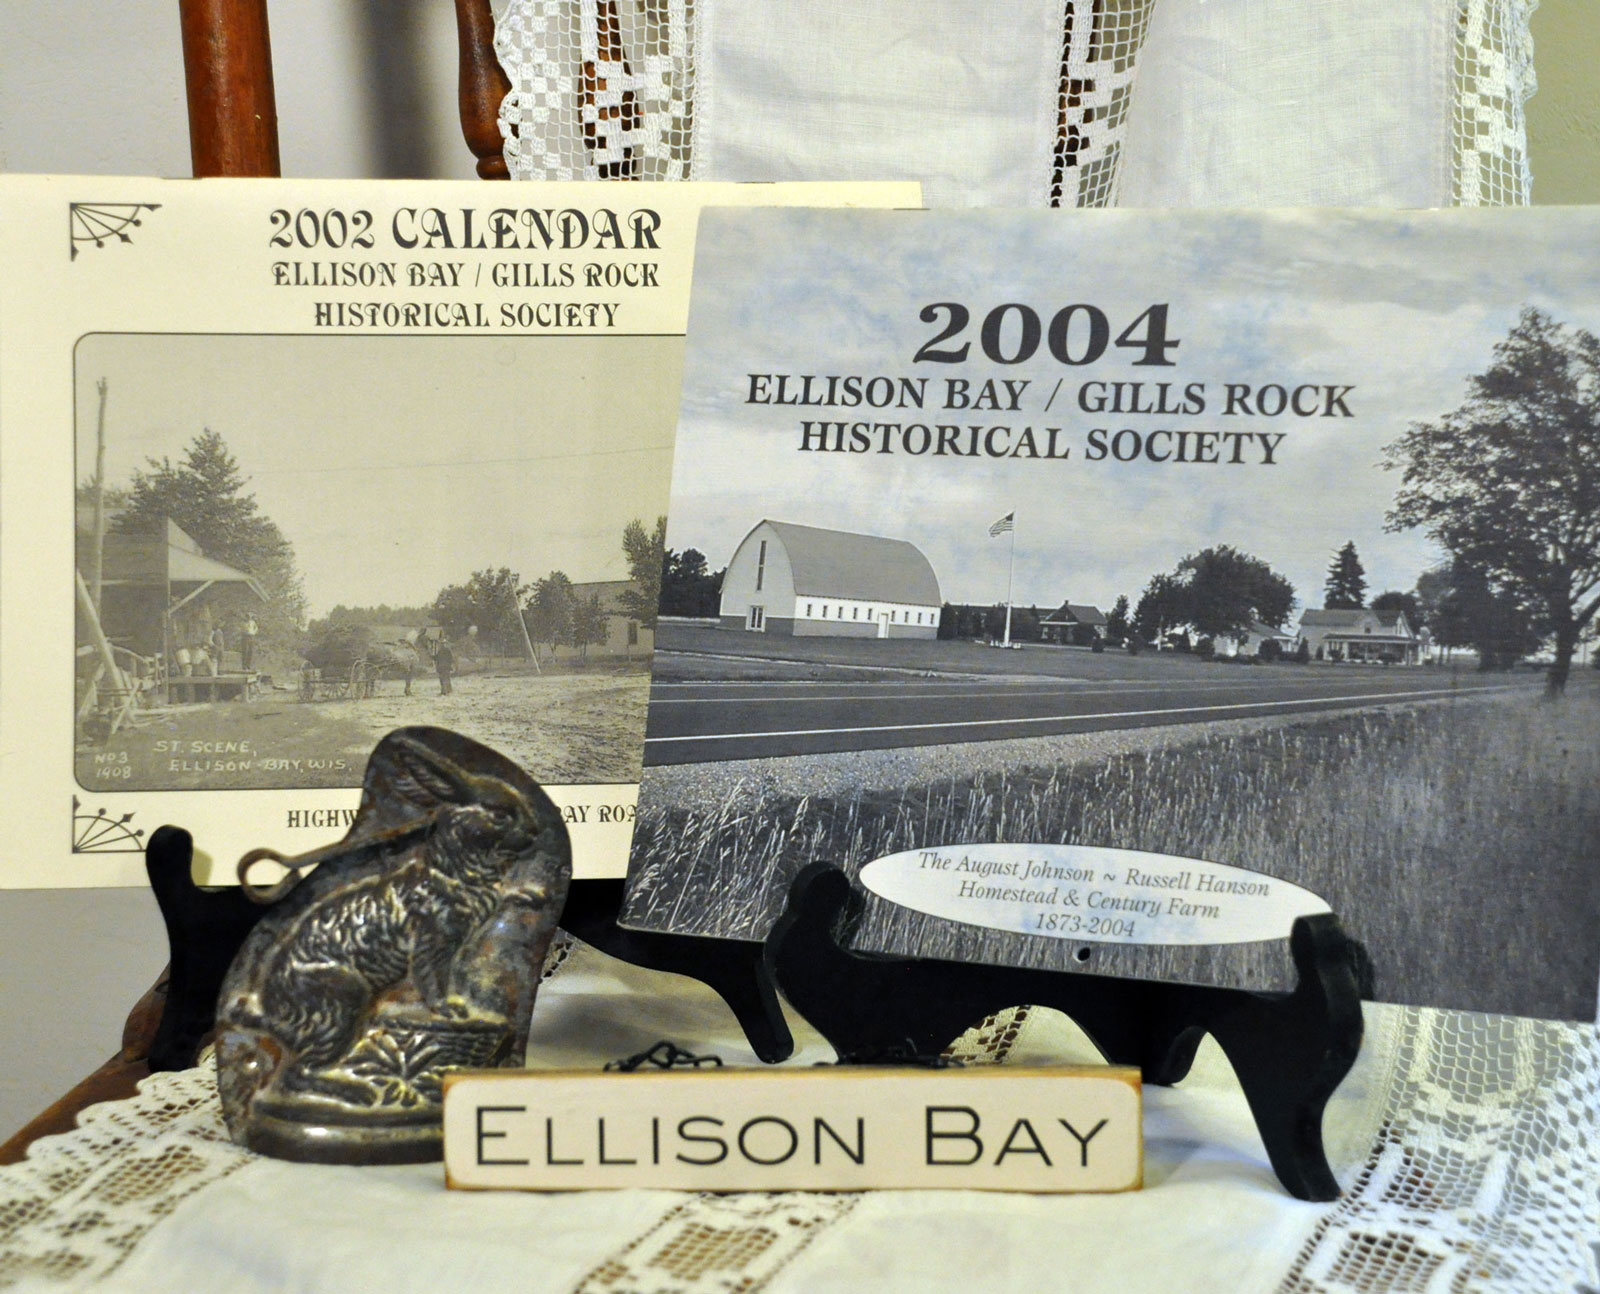 Ellison Bay/ Gills Rock 2002 & 2004 Calendars